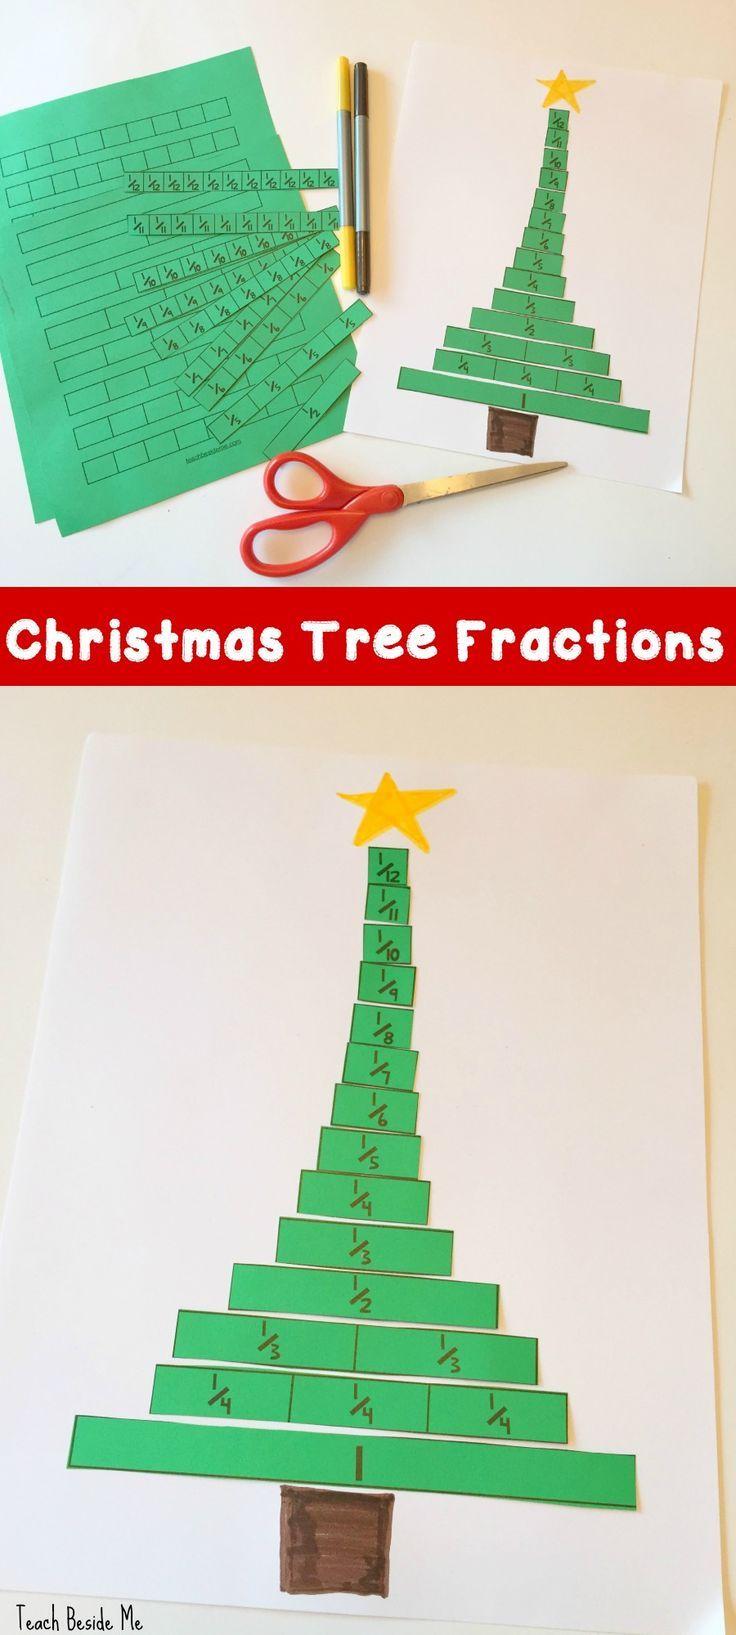 Fun and easy holiday math activity: Christmas Tree Fractions (with free printable) via @karyntripp